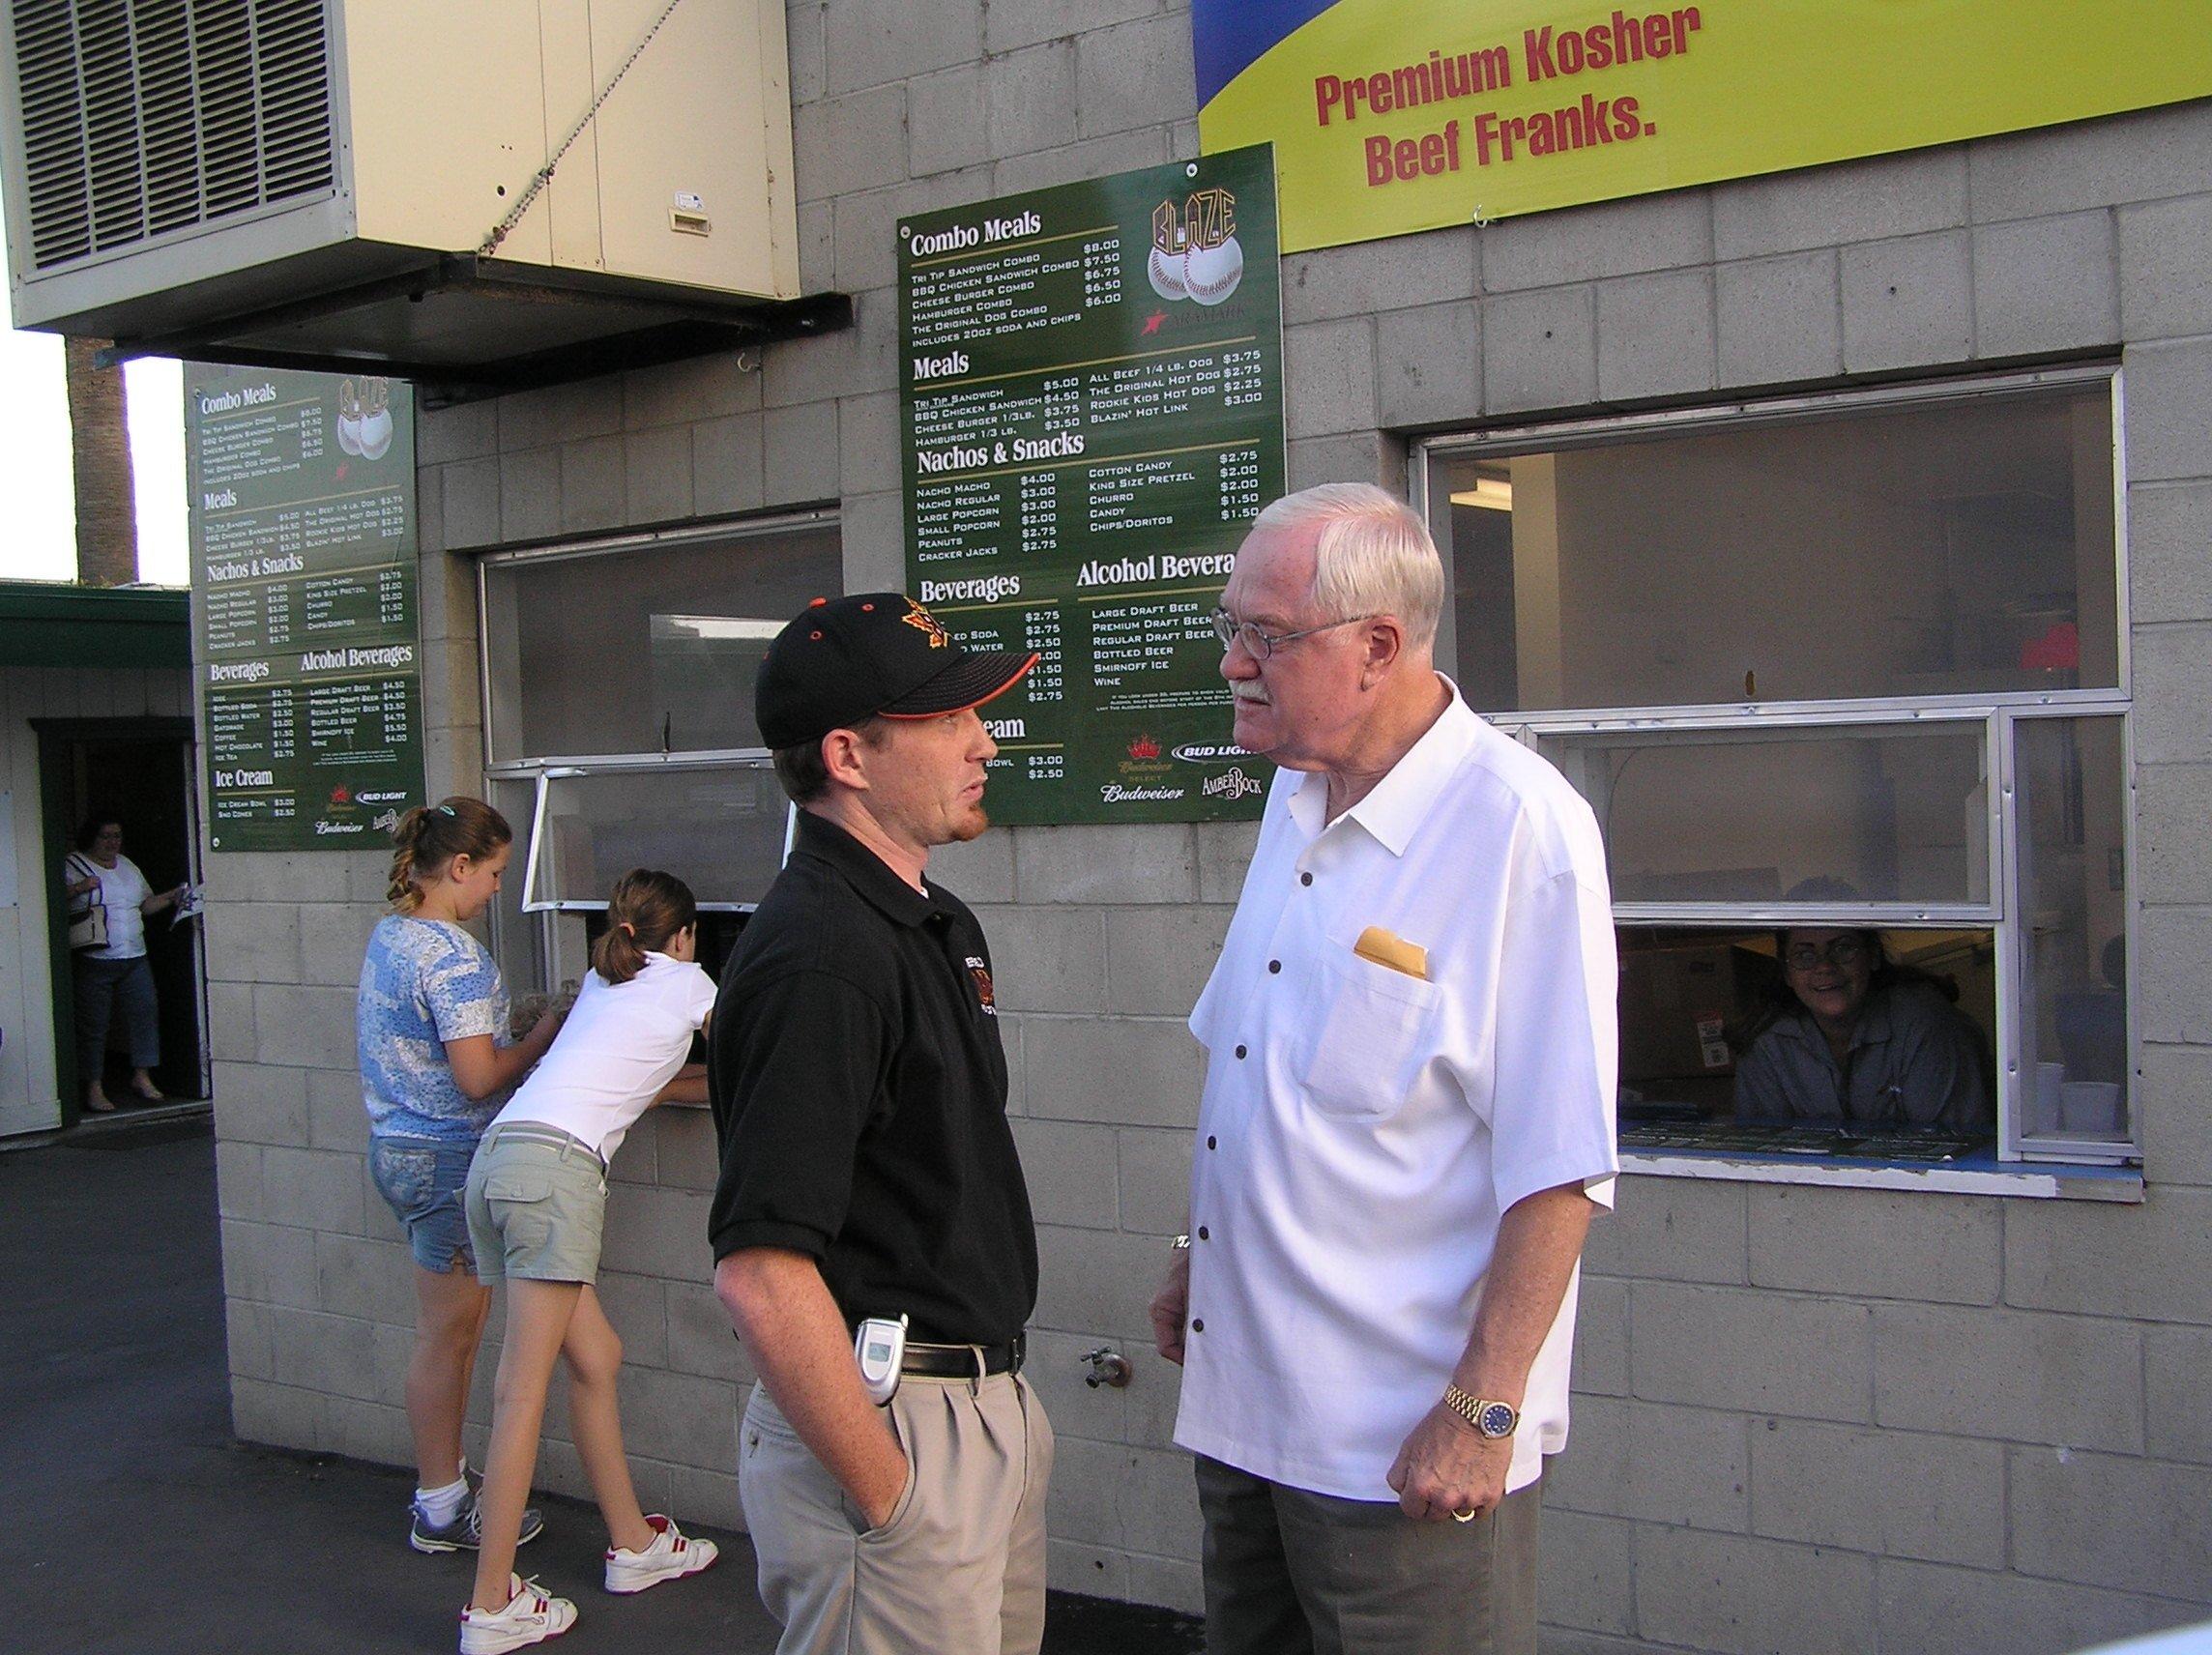 Brian and former Bakersfield mayor Harvey Hall talking baseball at a Bakersfield Blaze game.